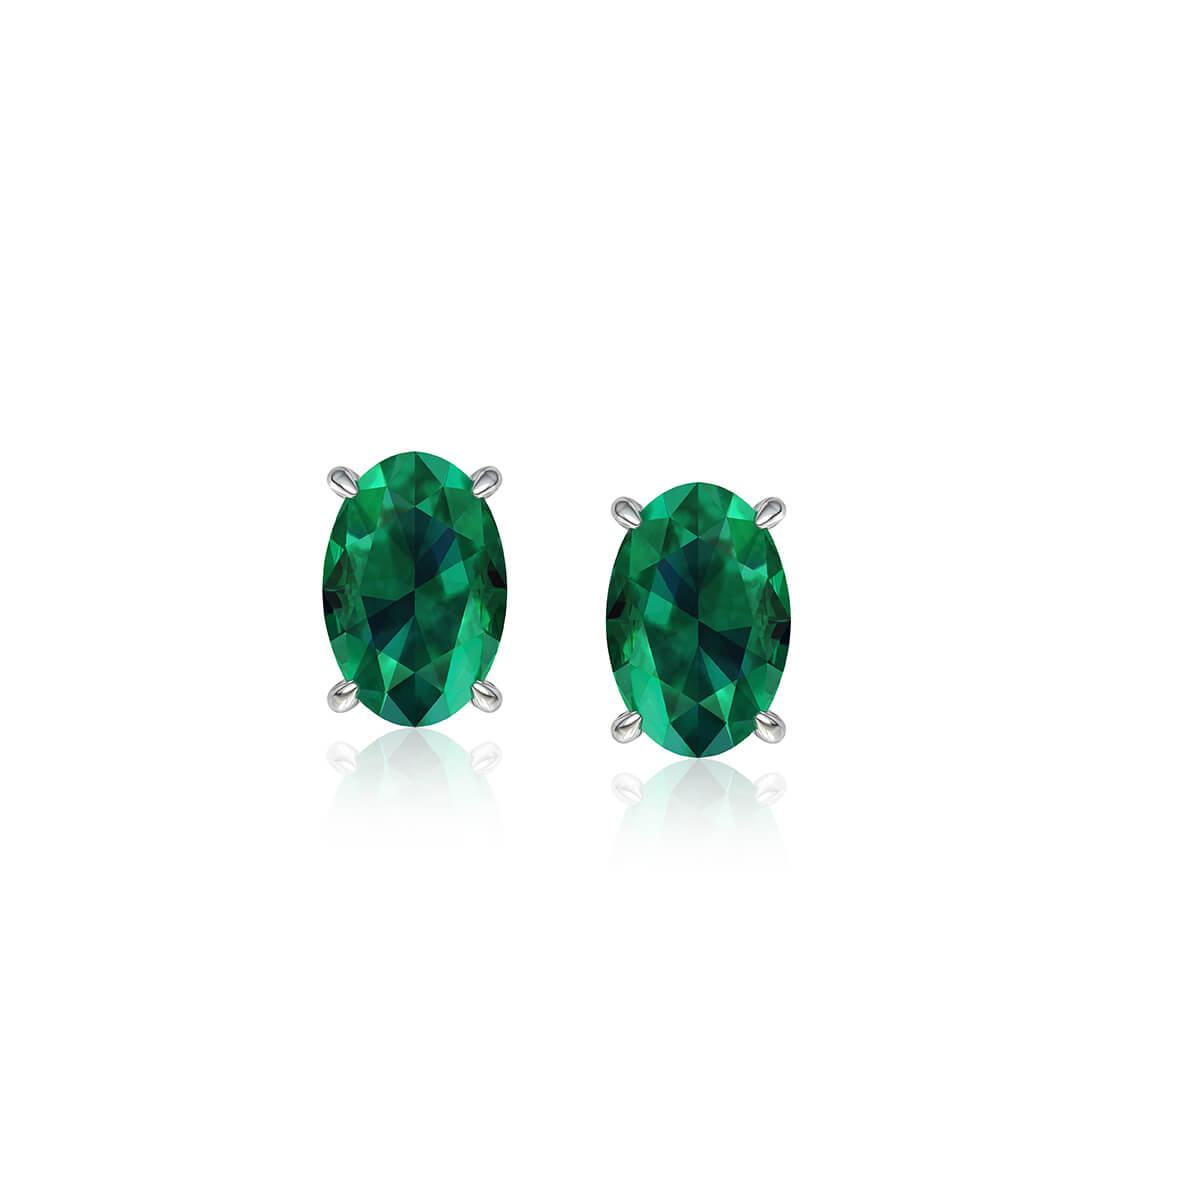 Esmeralda Oval Emerald Earrings